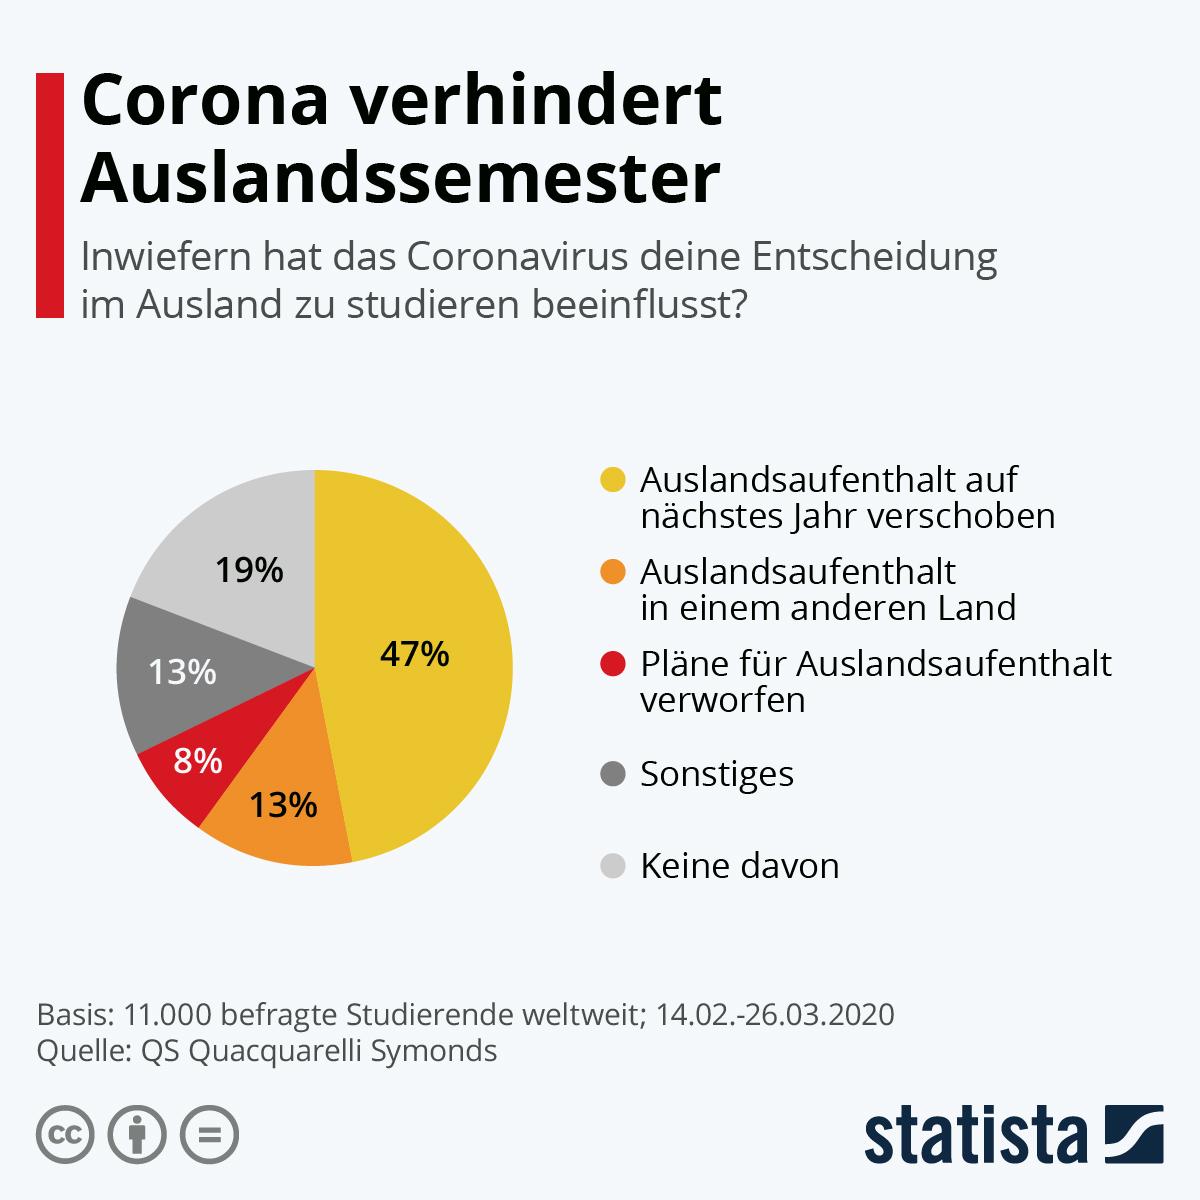 Infografik: Corona verhindert Auslandssemester | Statista